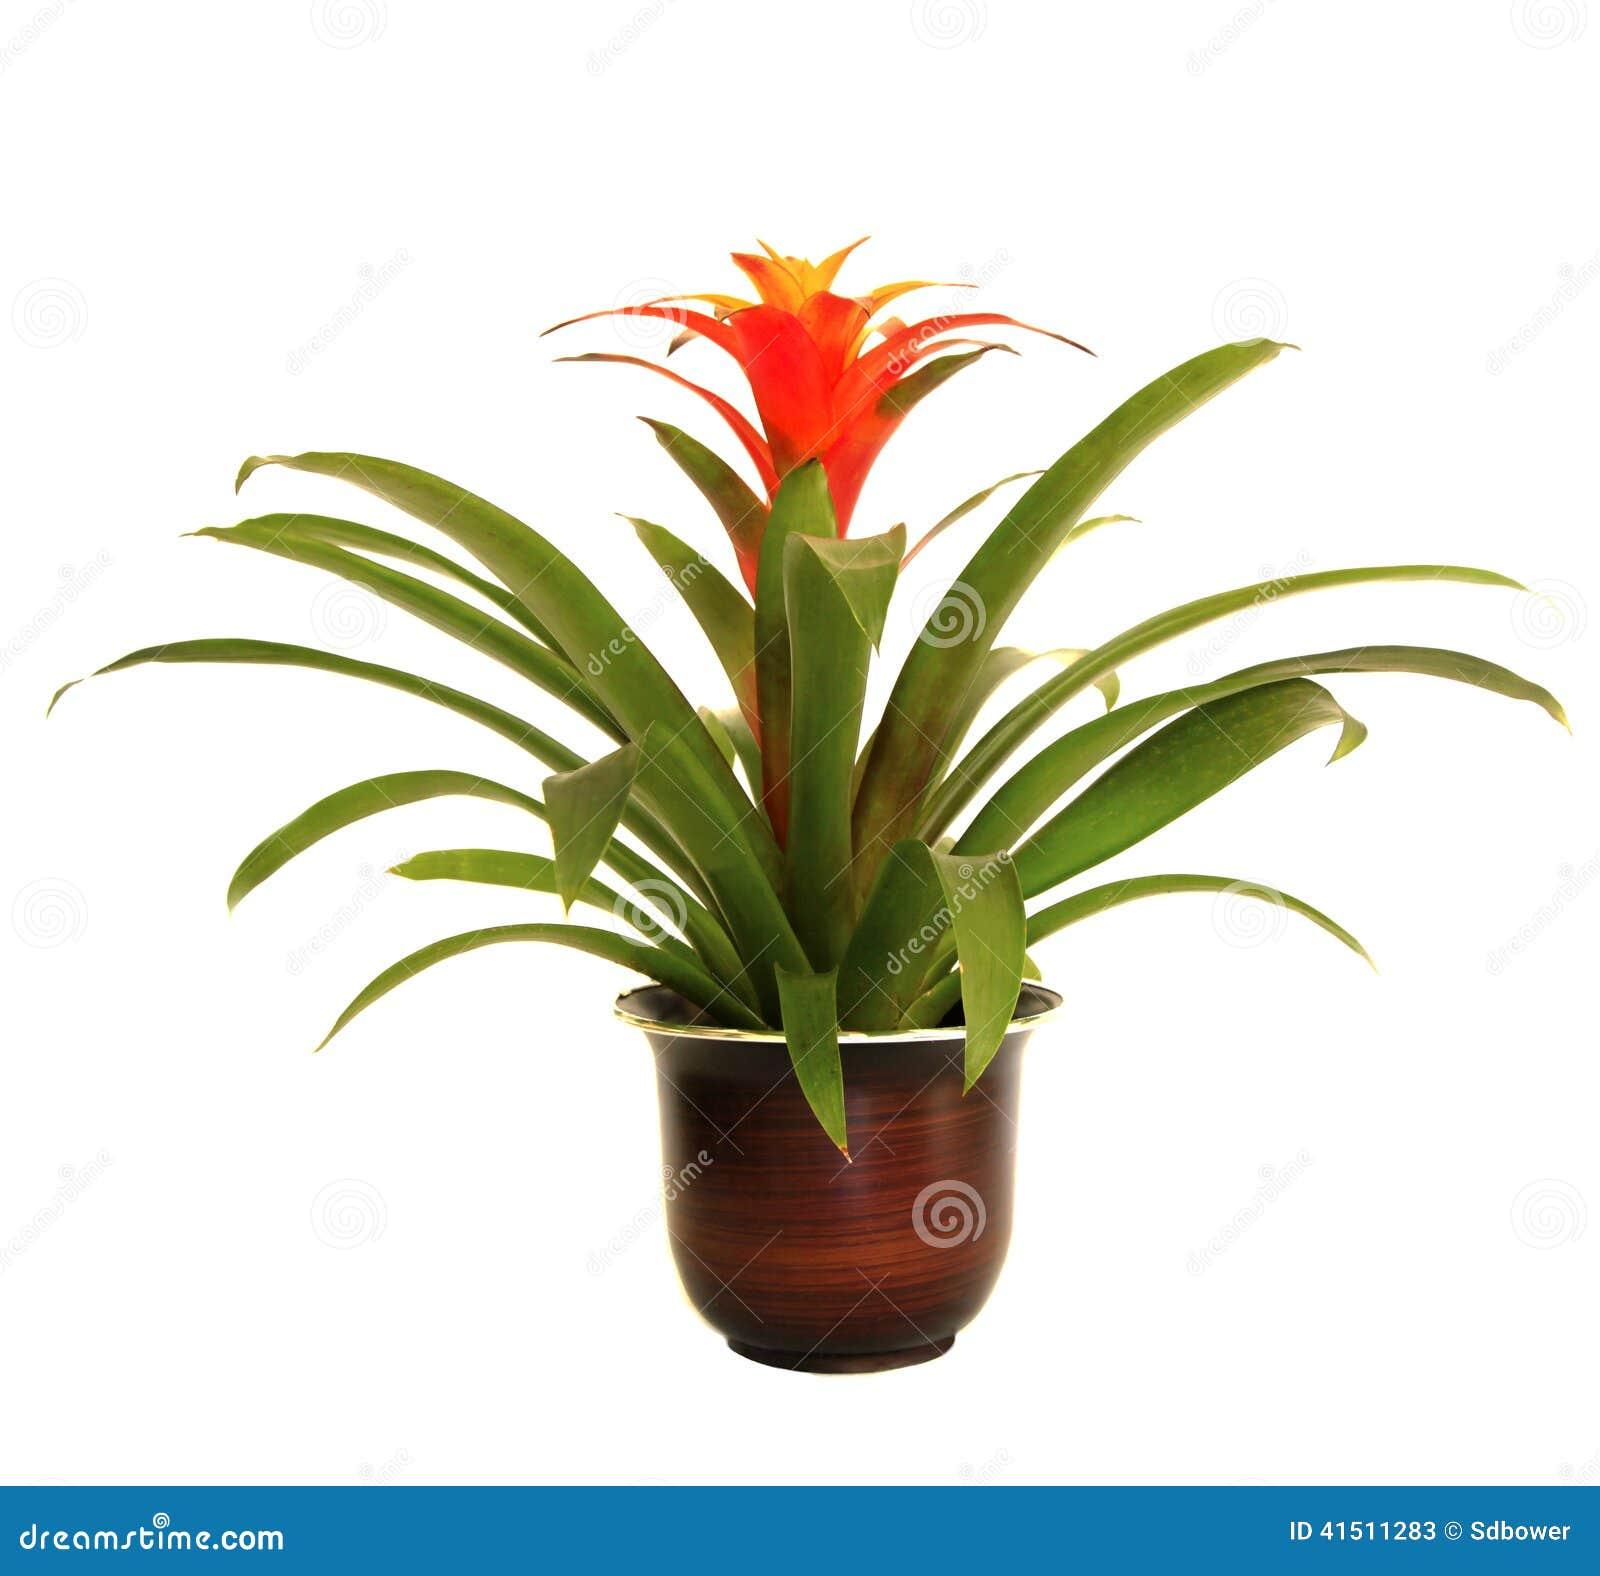 guzmania plant care instructions